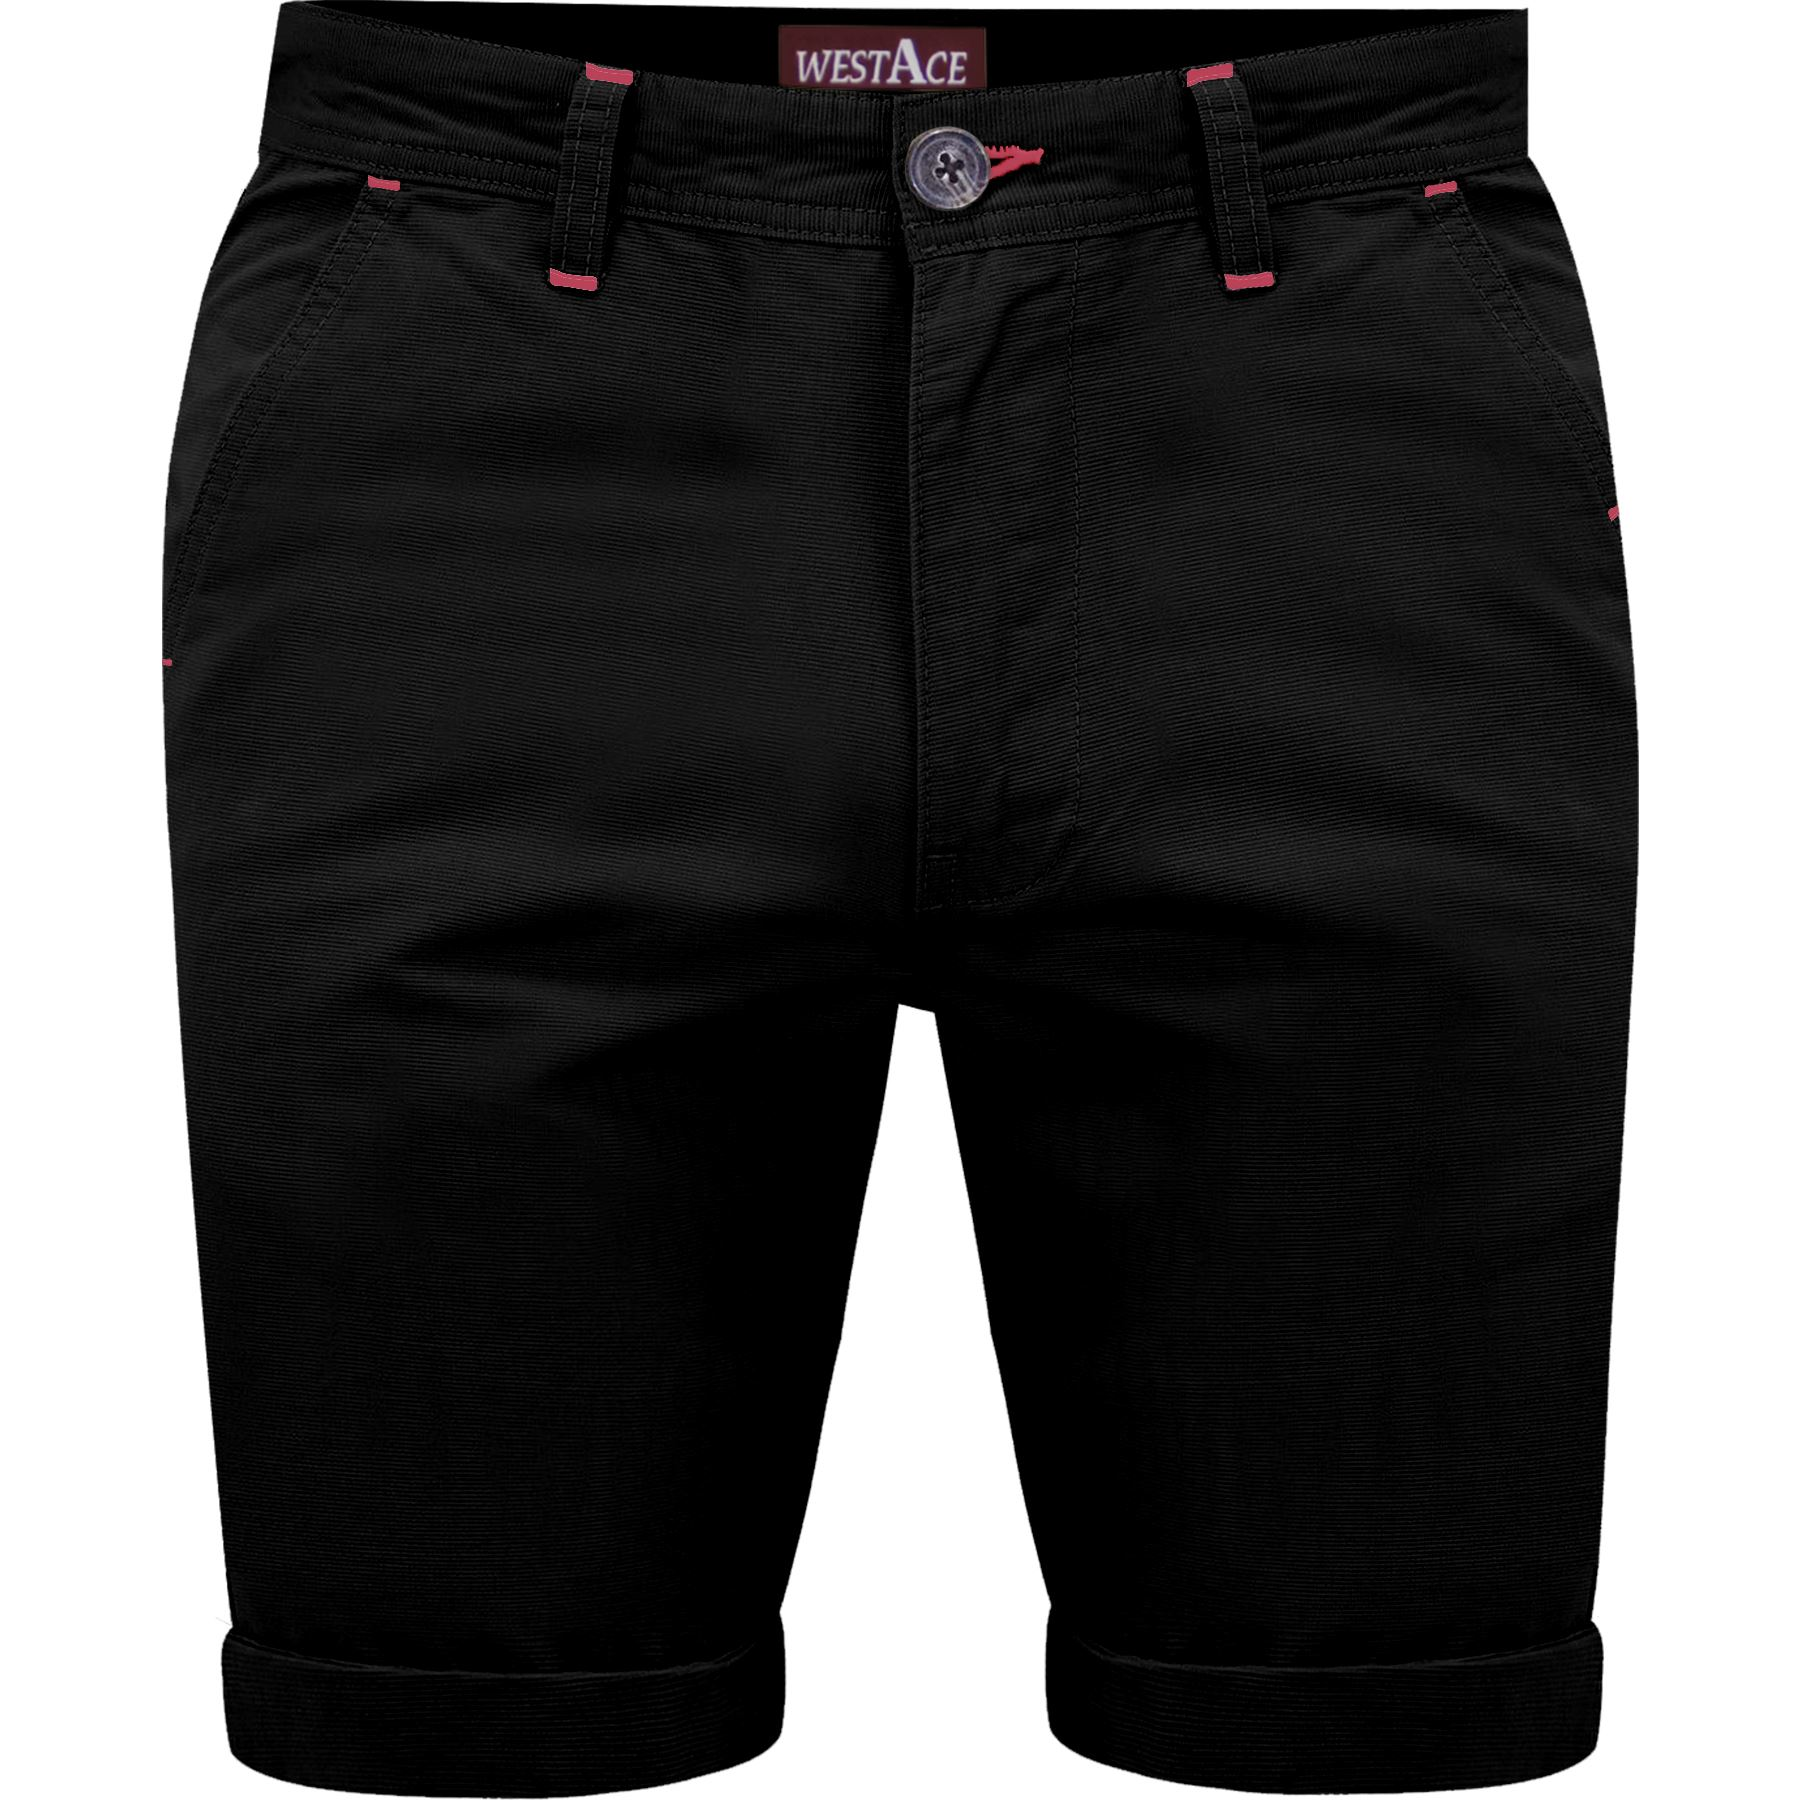 Mens-Chino-Shorts-Cotton-Summer-Casual-Jeans-Cargo-Combat-Half-Pants-Casual-New thumbnail 3